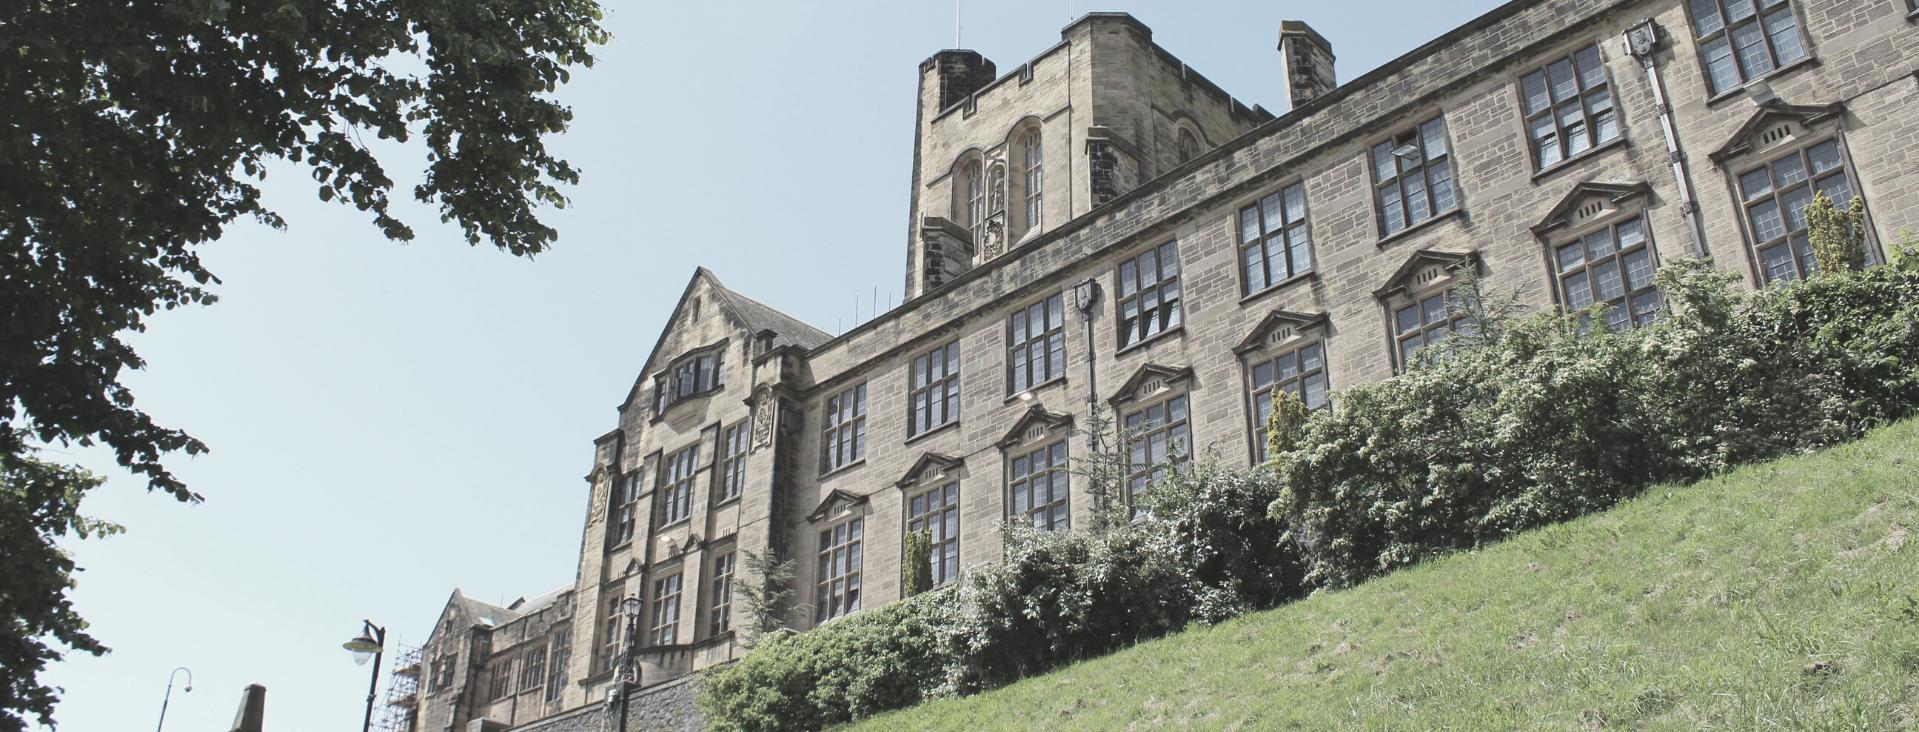 Picture of Bangor University Main Arts Building